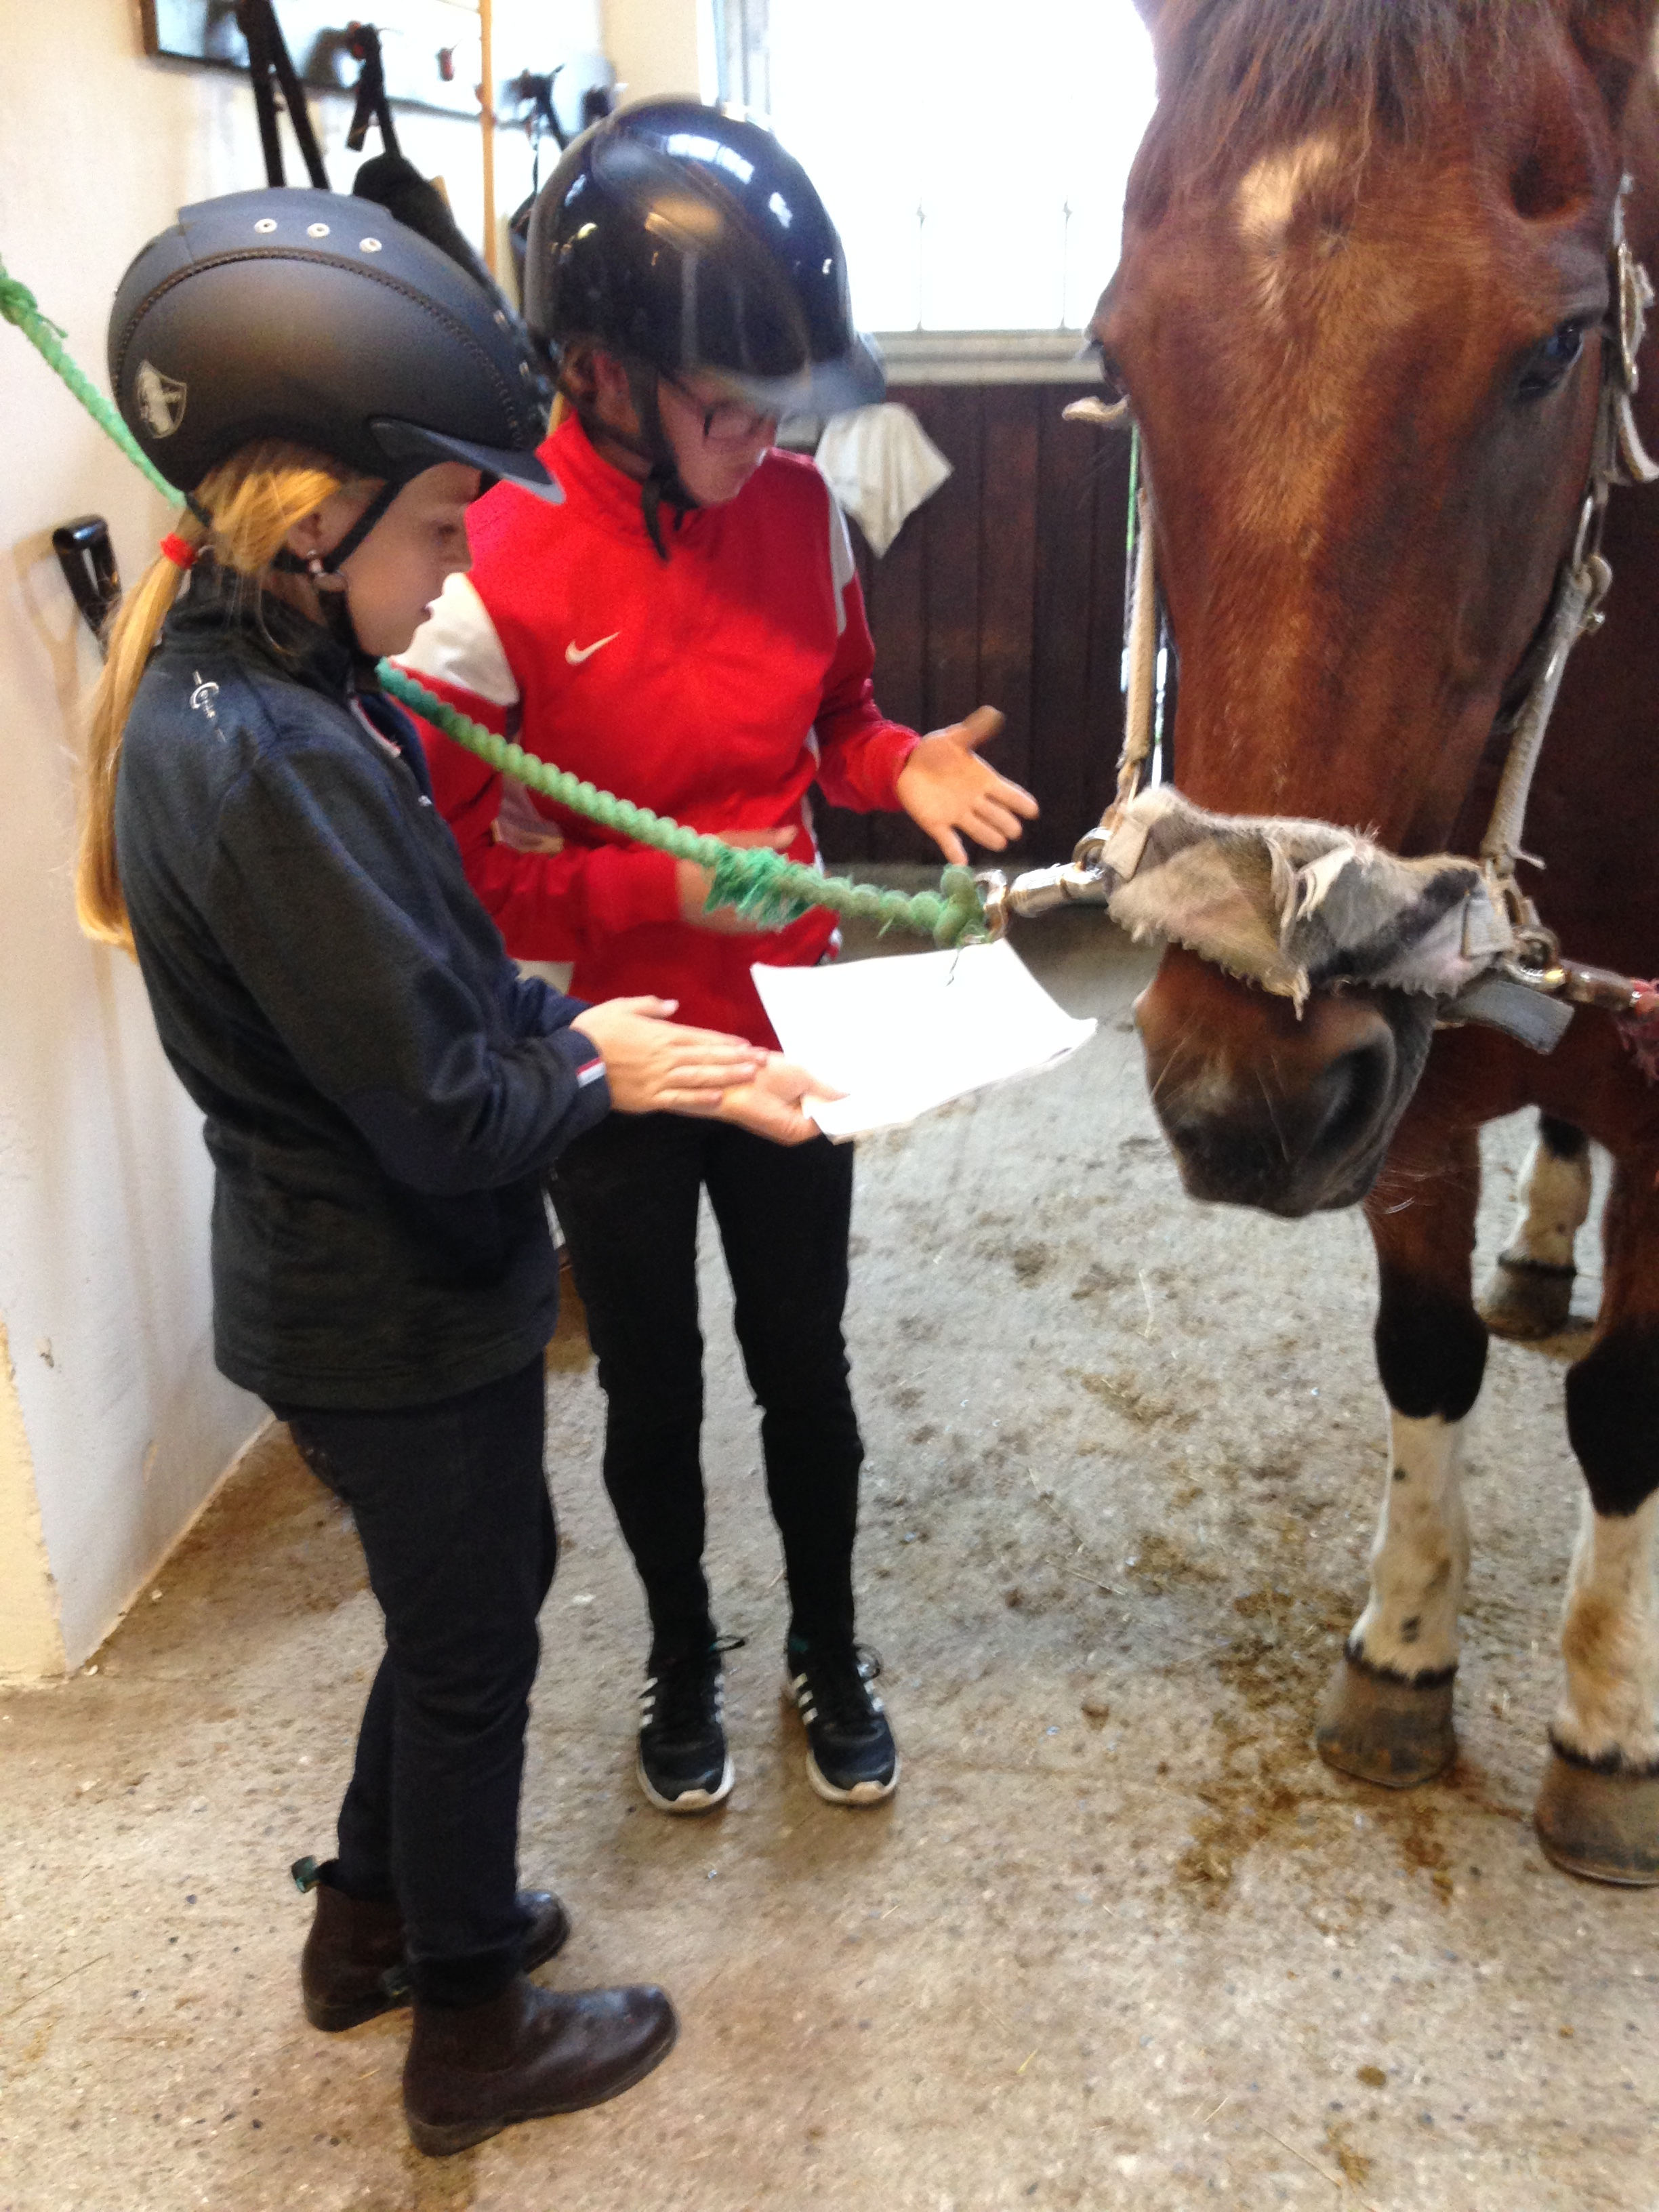 kursus hestemassage rideskole